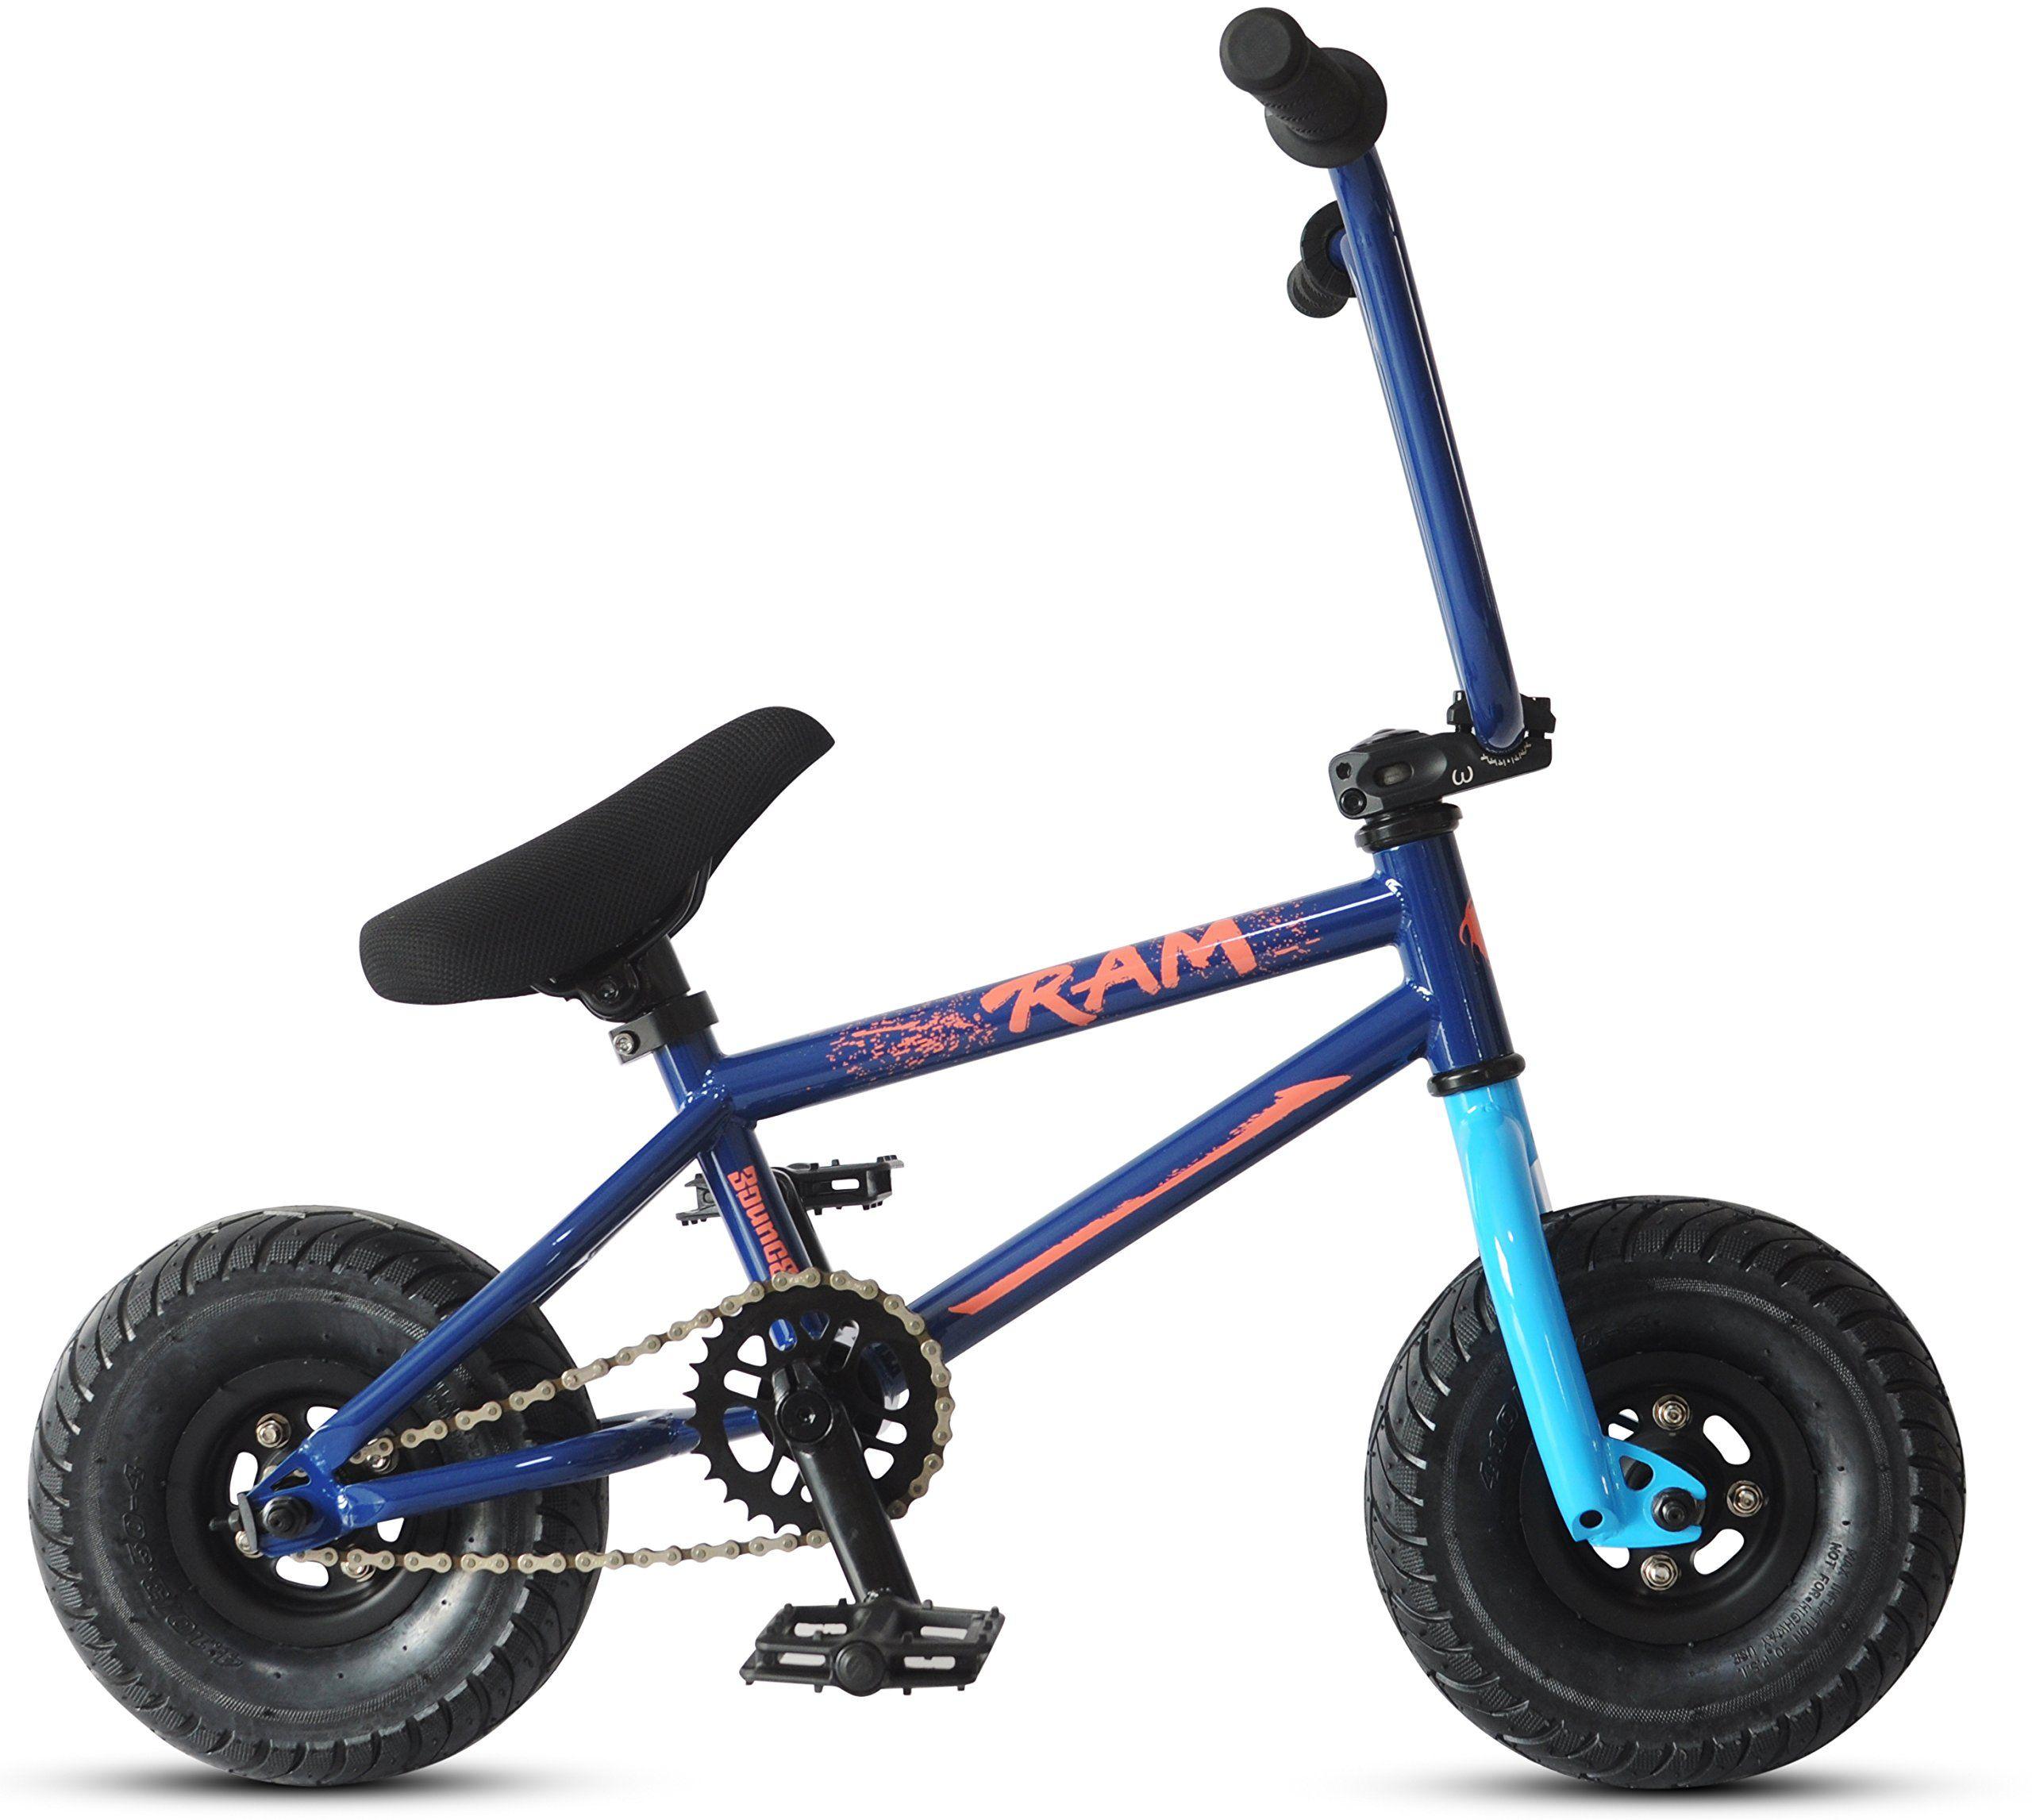 Bounce Ram Mini Bmx Bike Bmx Bikes Bmx Cool Bike Accessories